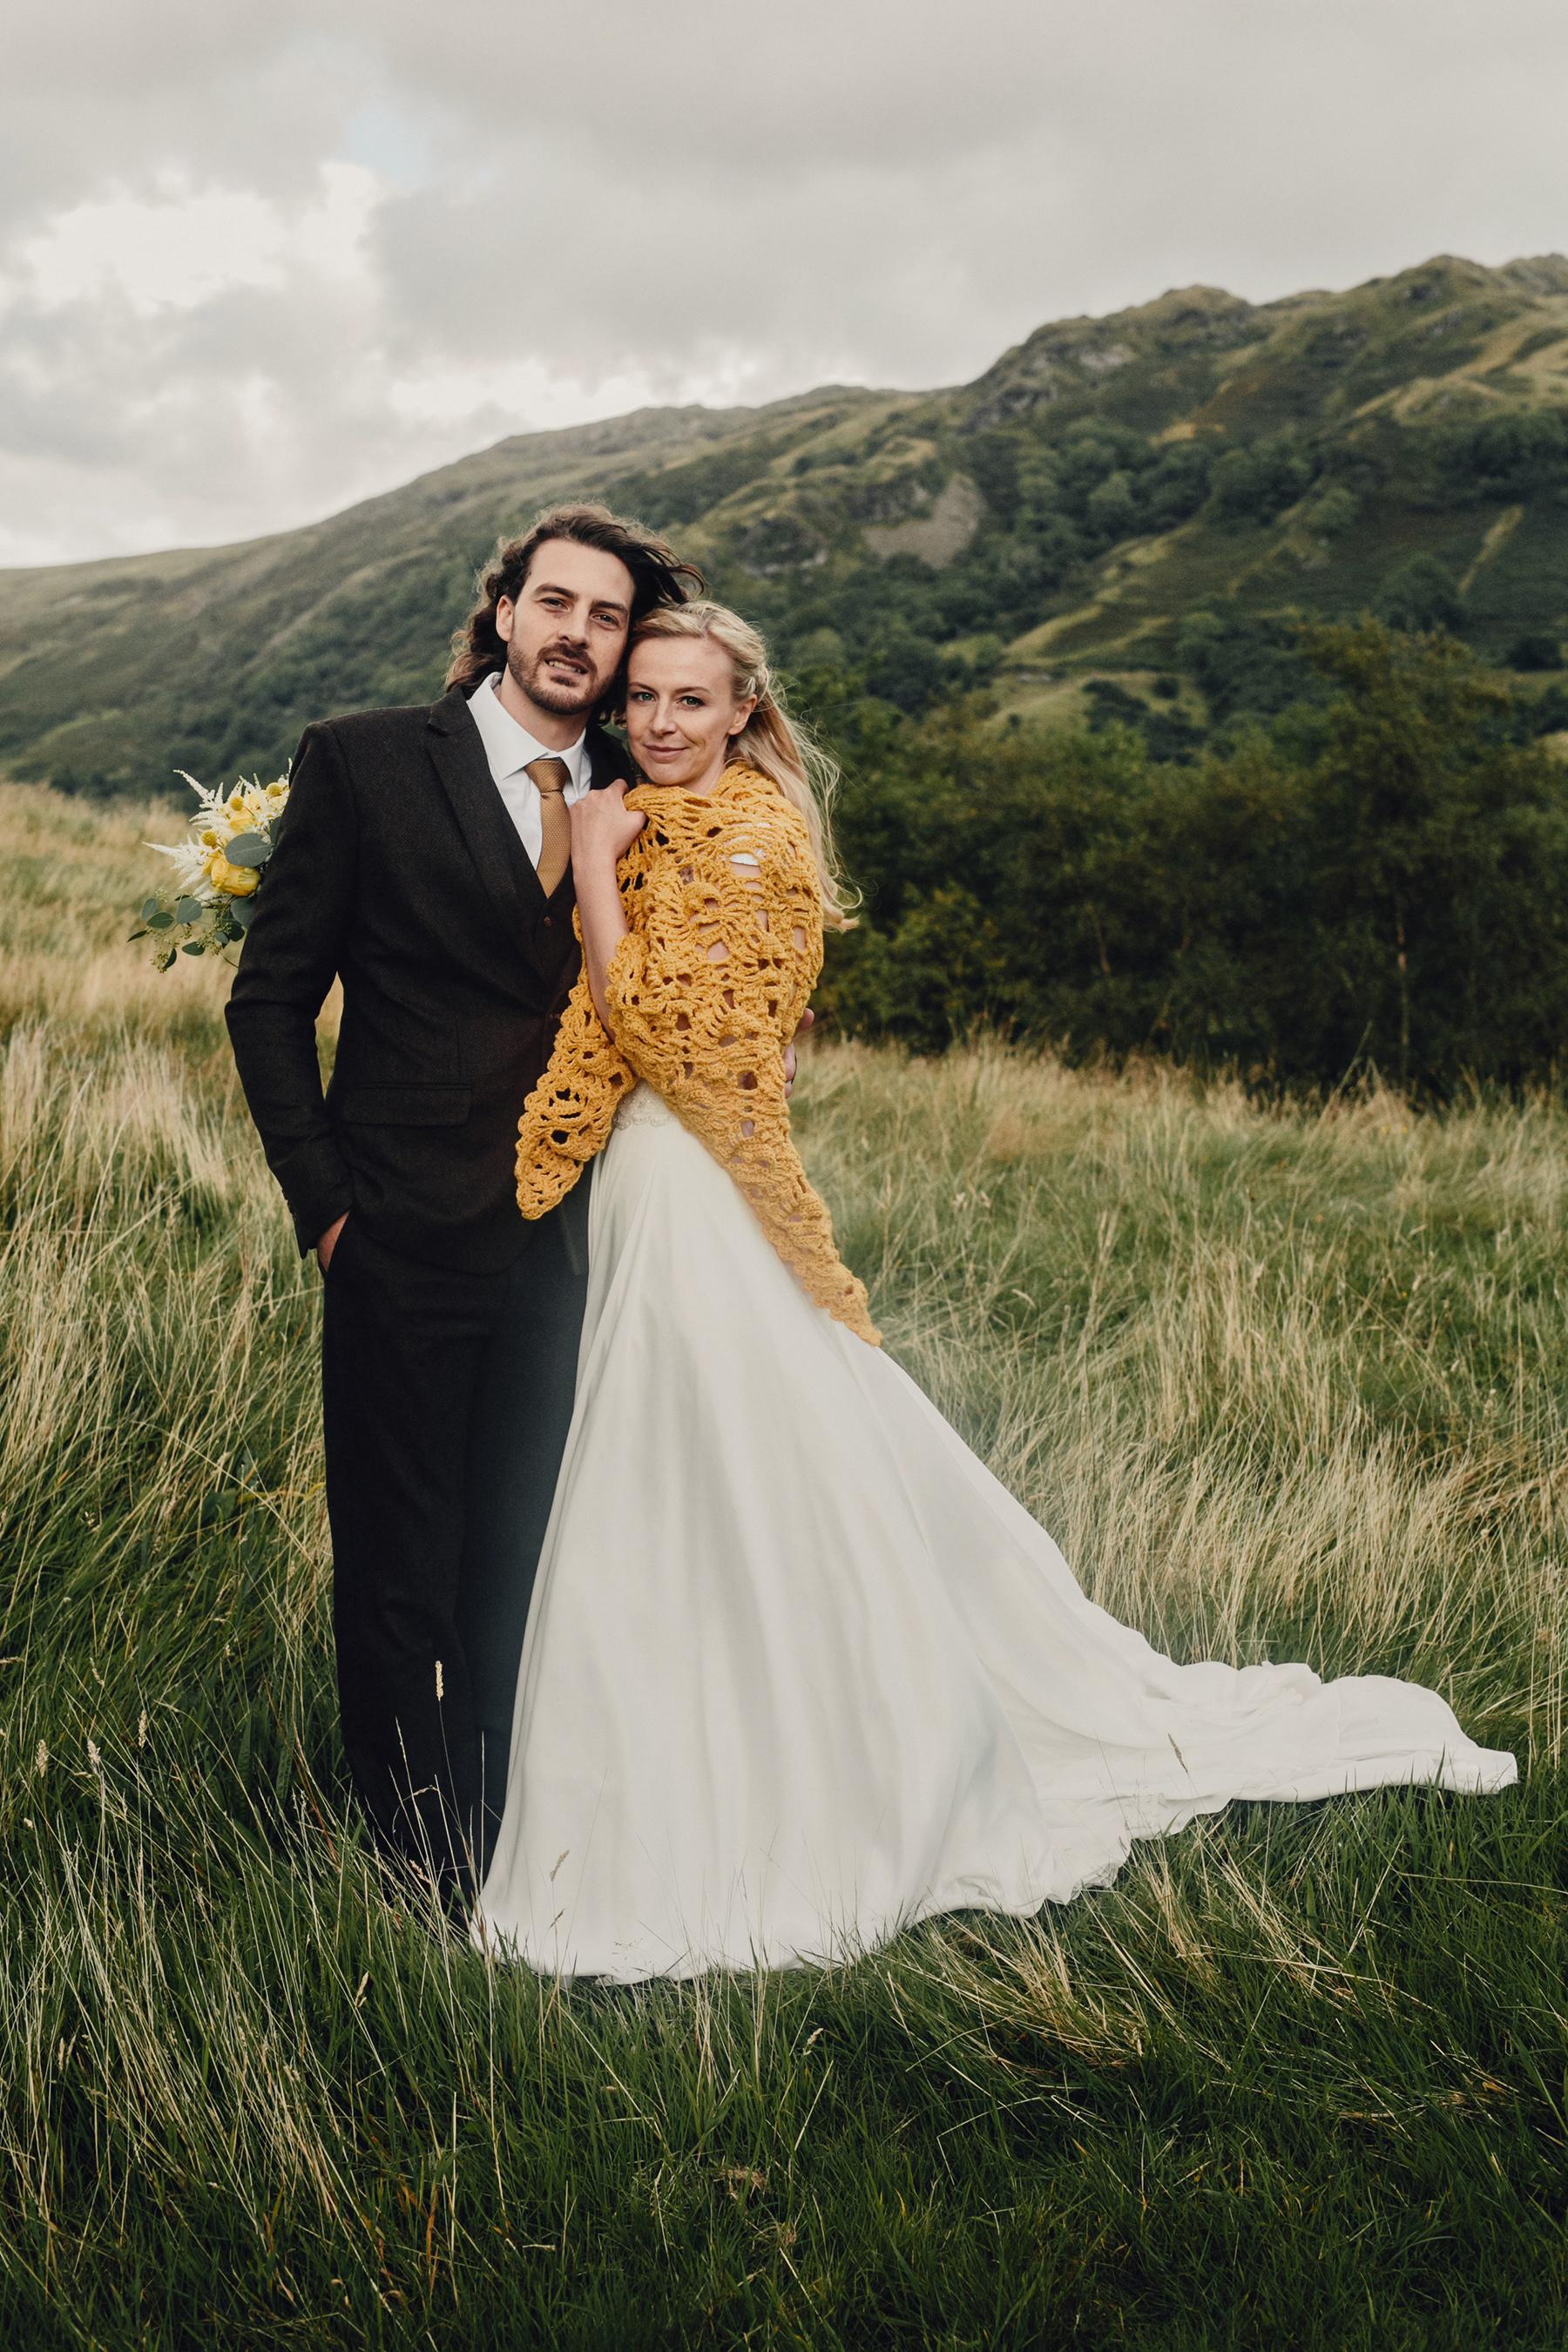 Snowdonia-Wales-Wedding-Photos-0349.jpg